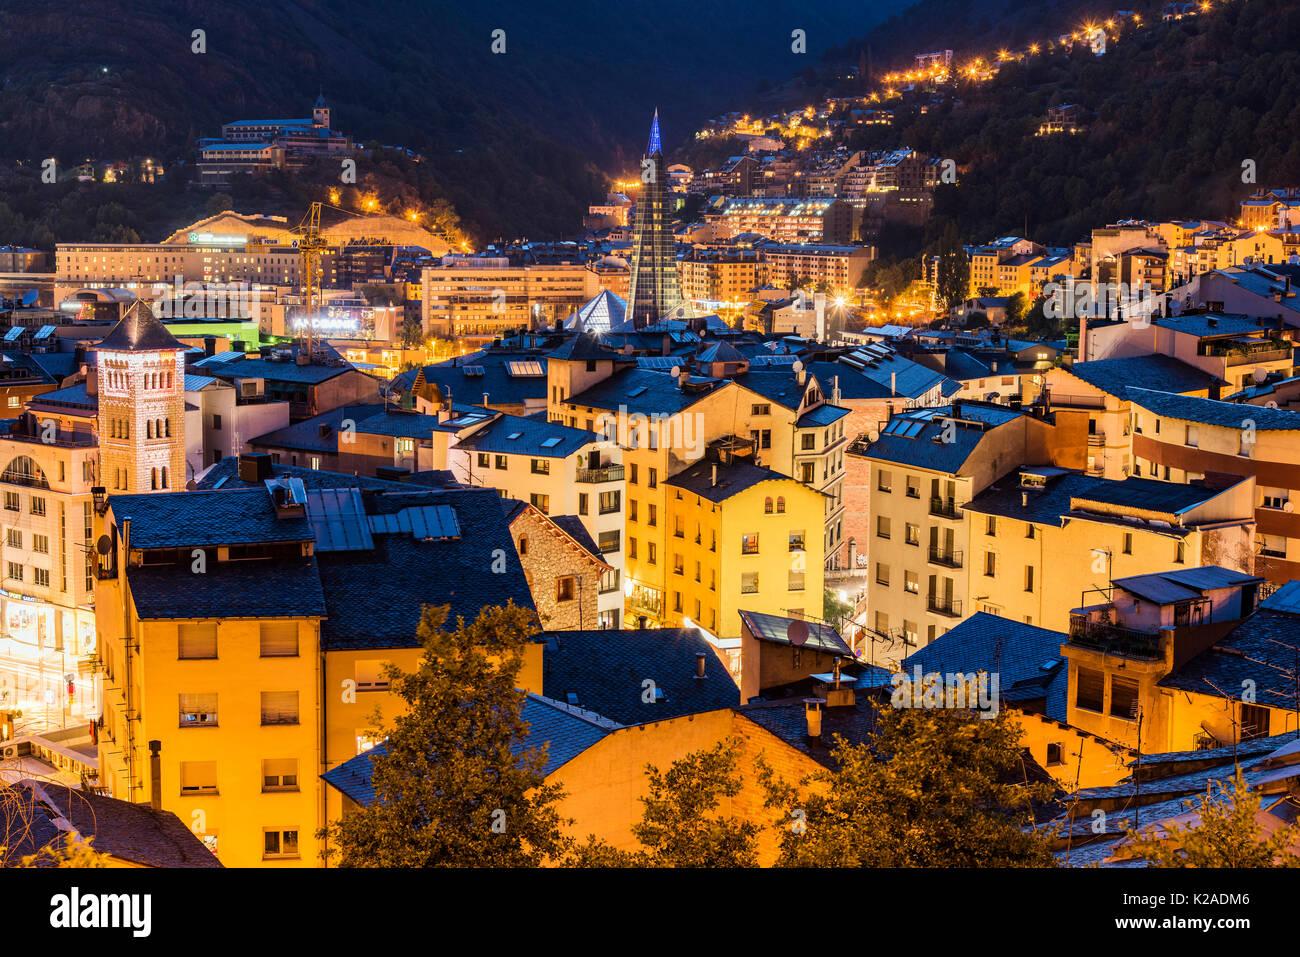 City skyline at night, Andorra La Vella, Andorre Photo Stock